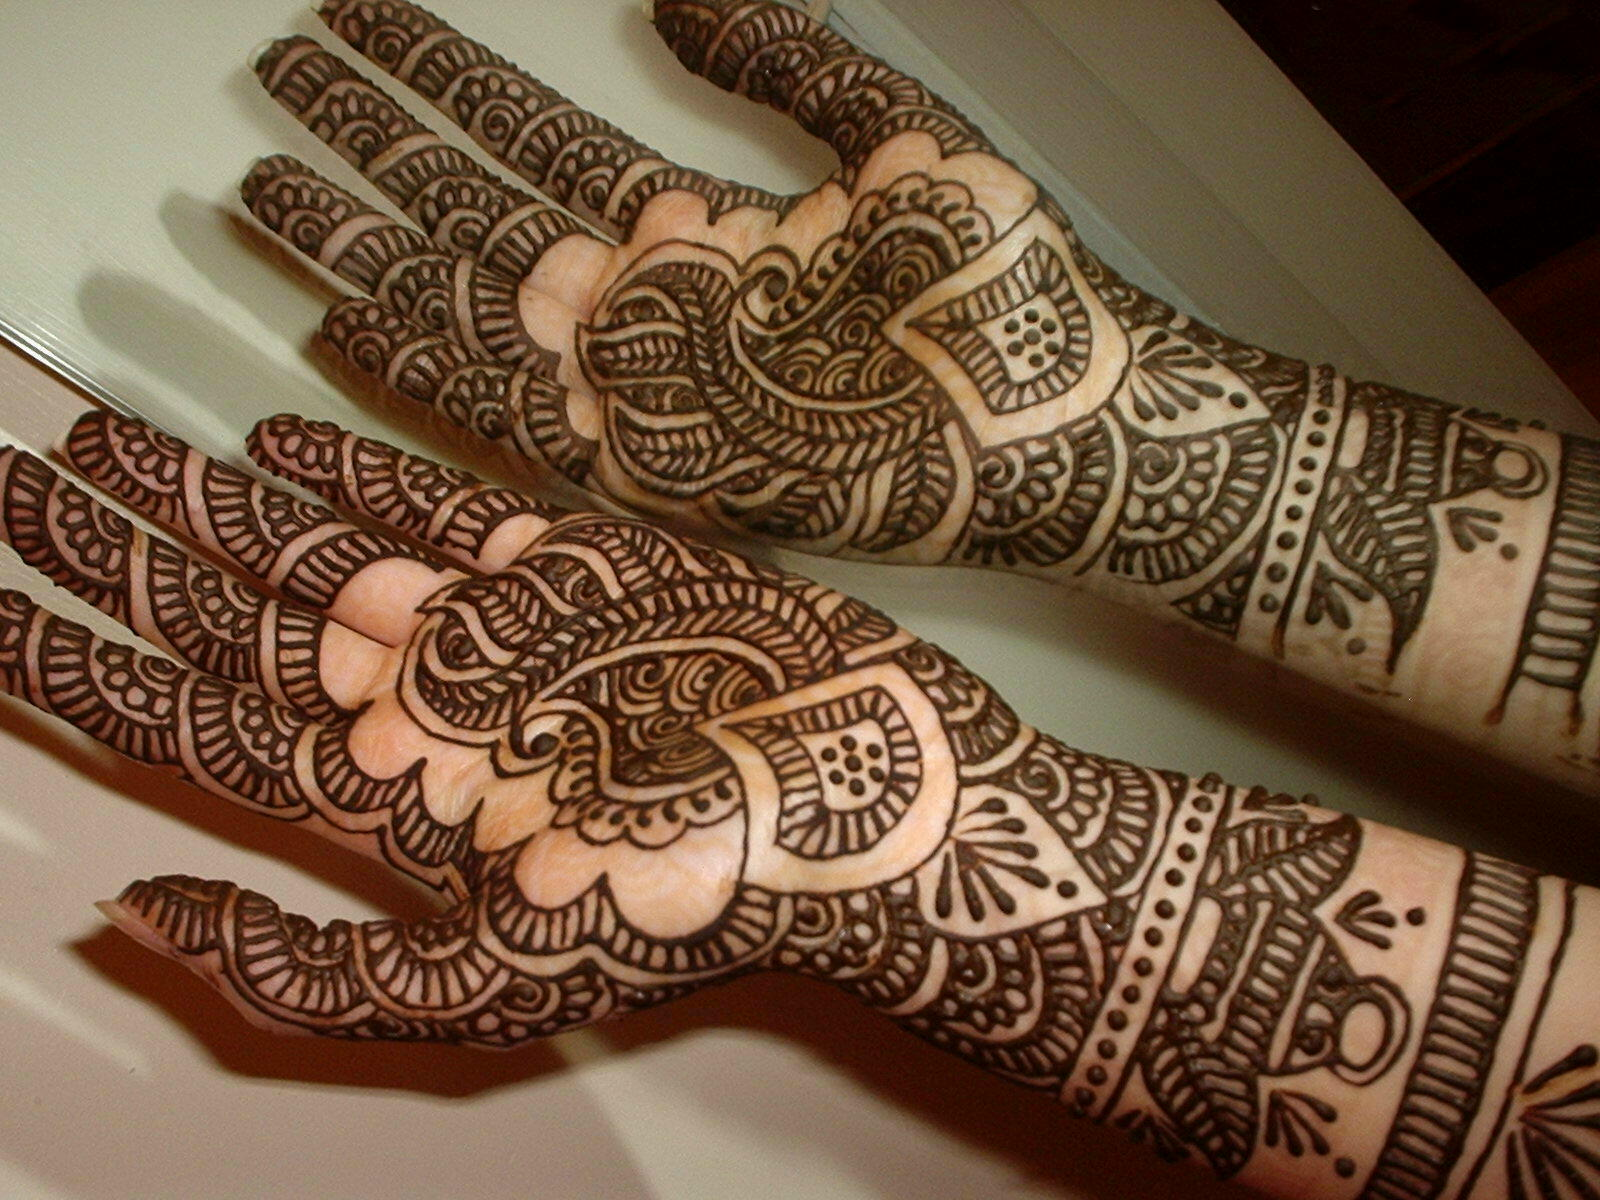 pakistani mehandi designs 2012 henna designs. Black Bedroom Furniture Sets. Home Design Ideas